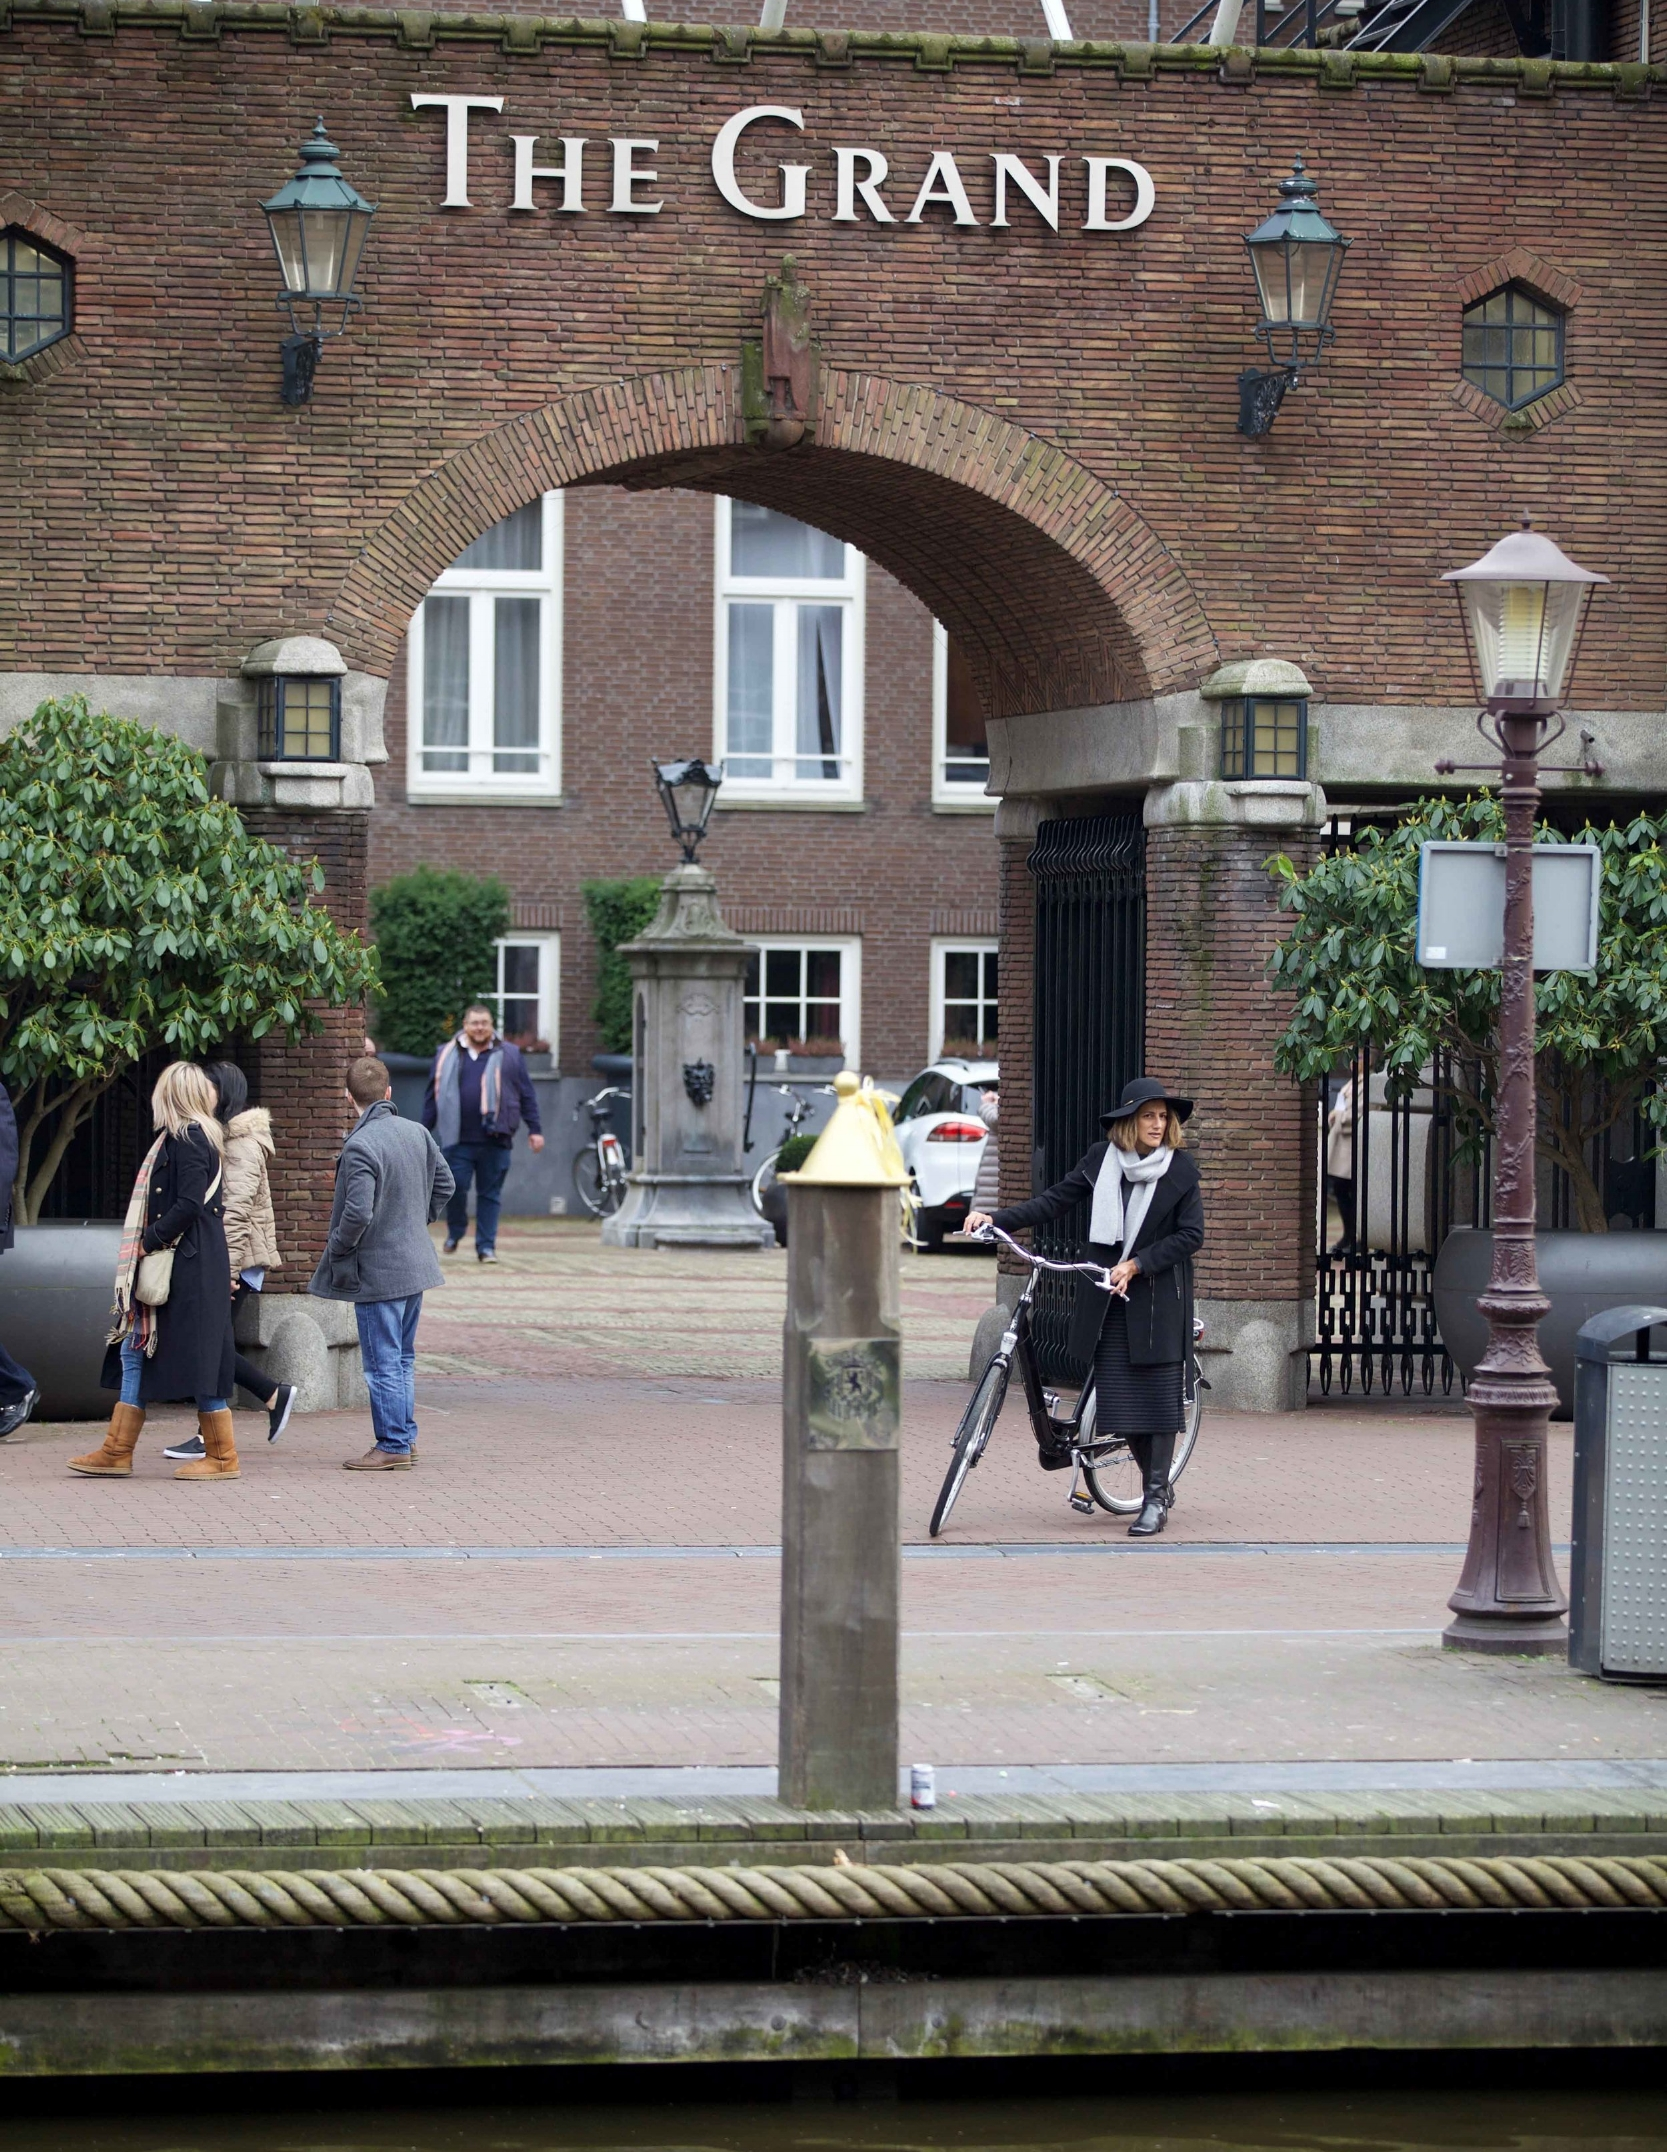 Grand bike tour, Sofitel Legend Amsterdam The Grand. Photo: Fabio Ricci. Image©thingstodot.com